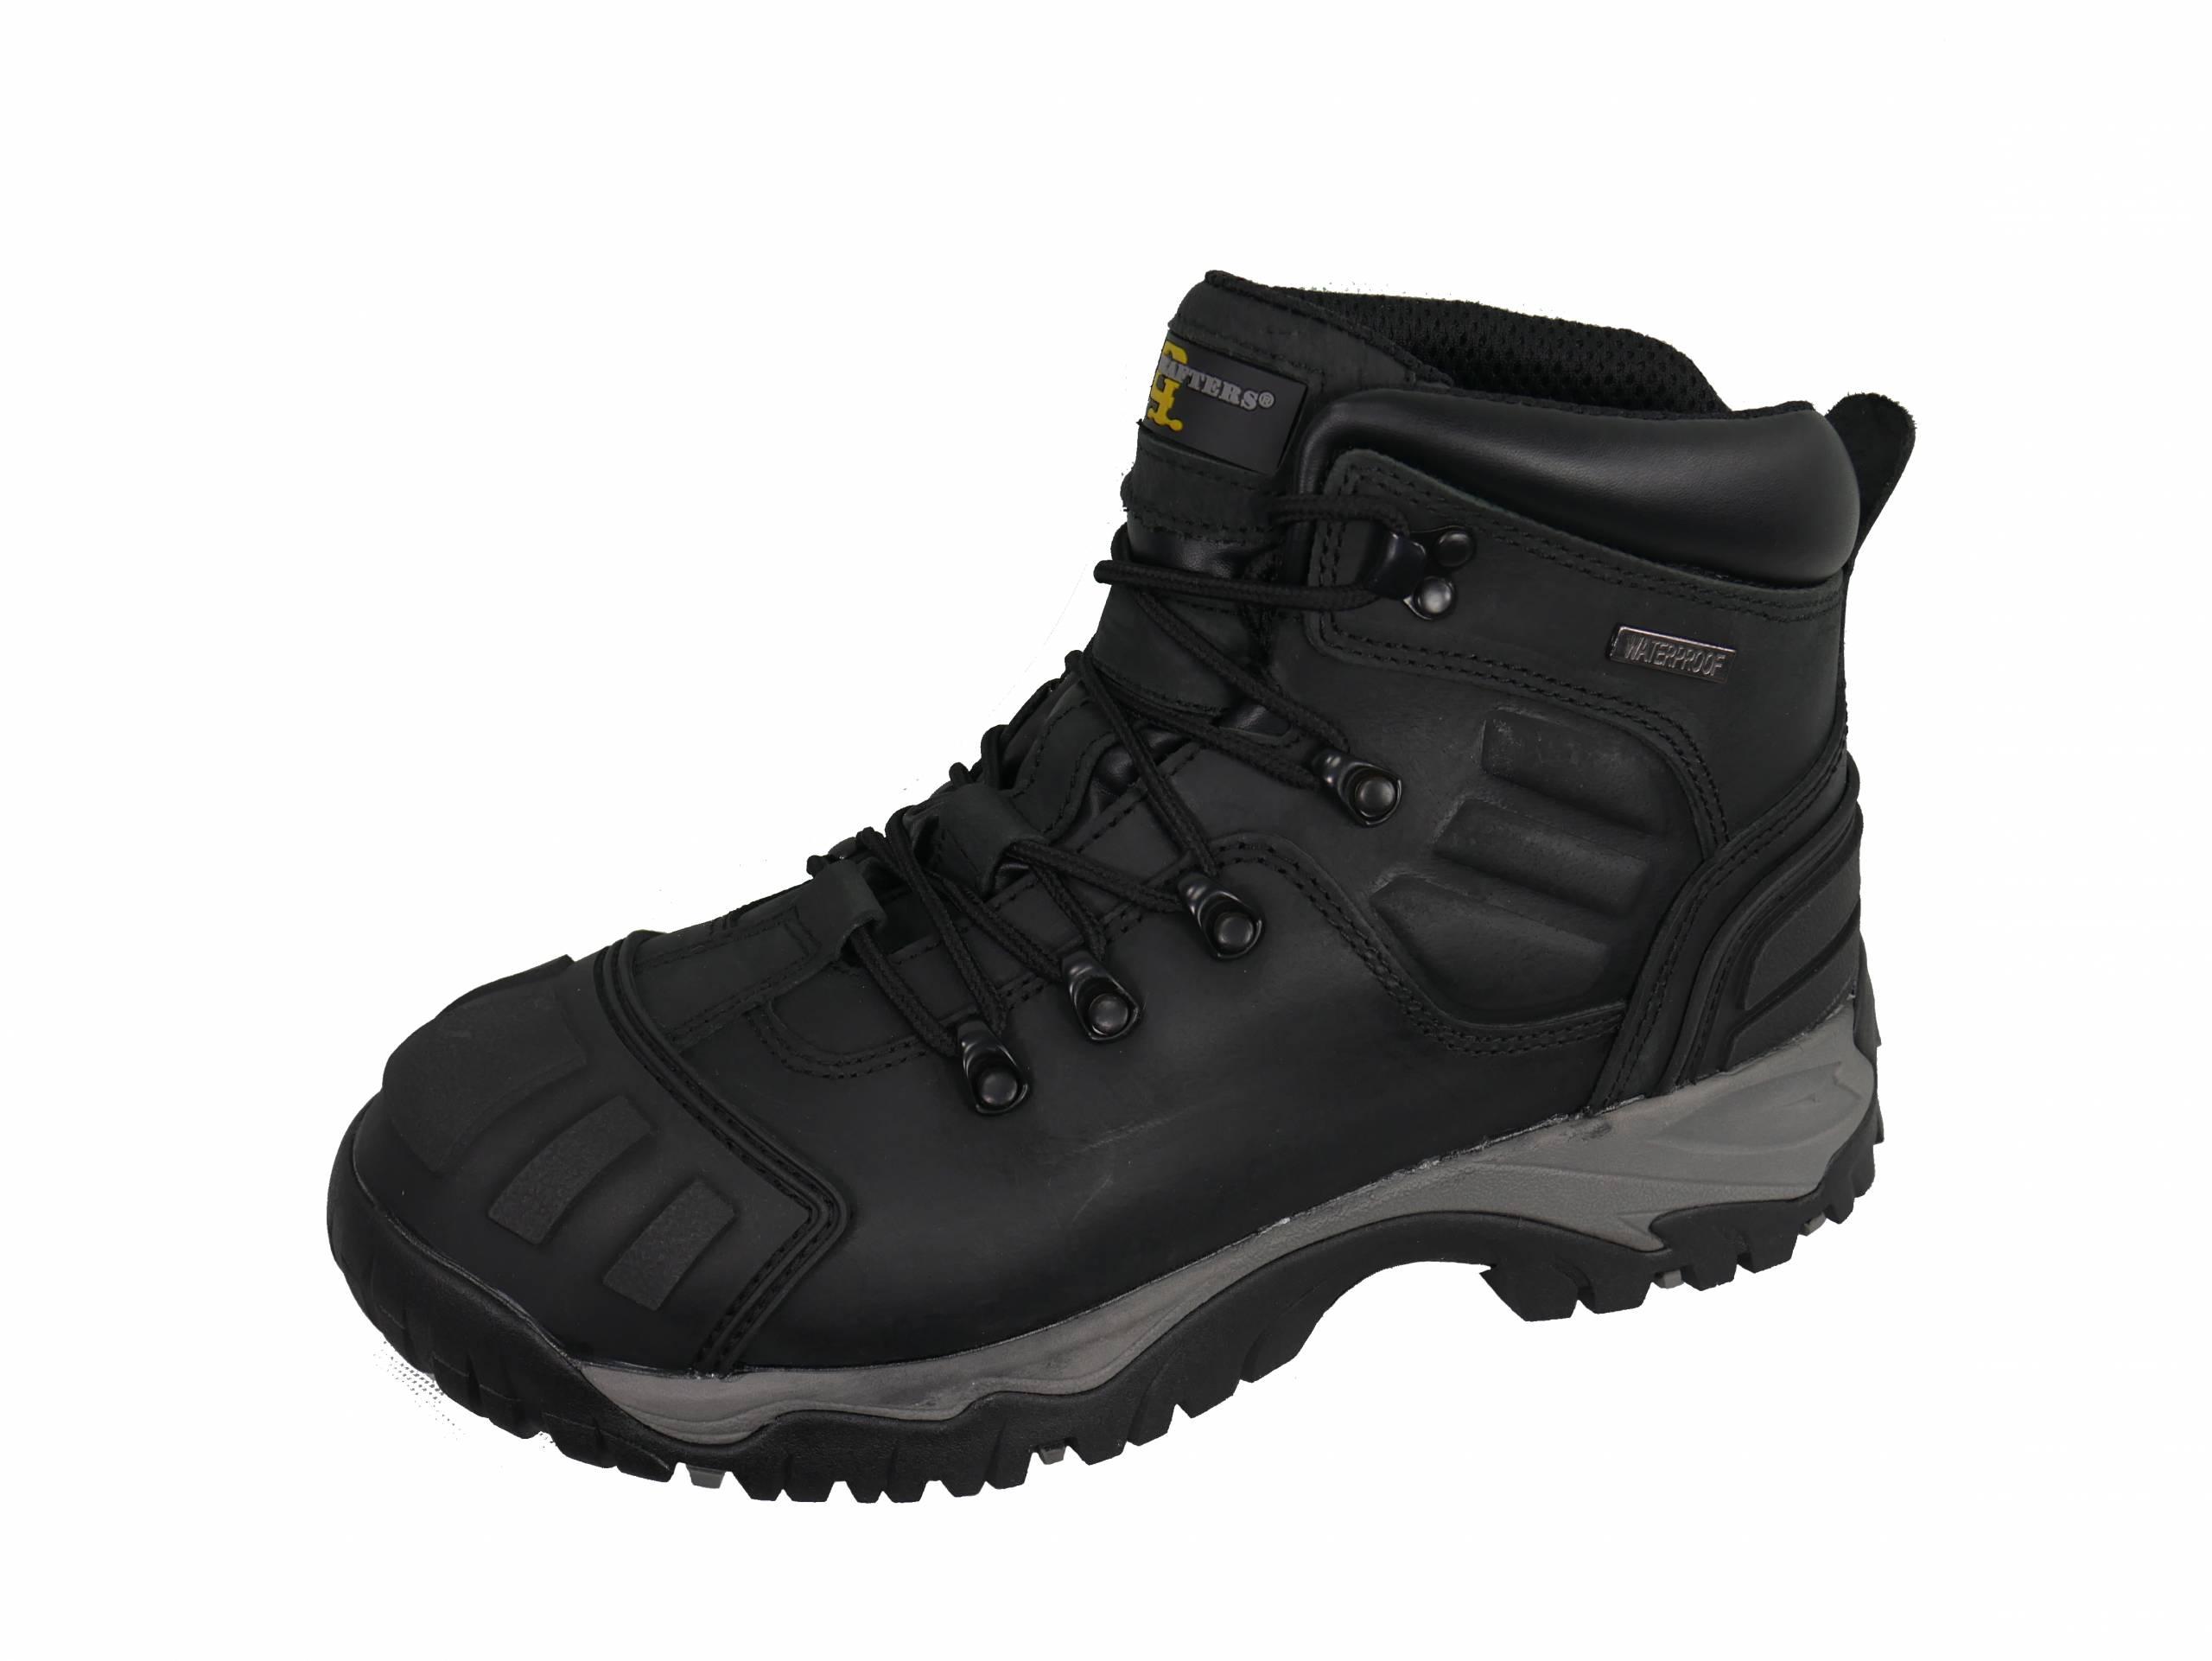 Full Grain Buffalo Leather Black Boots product image